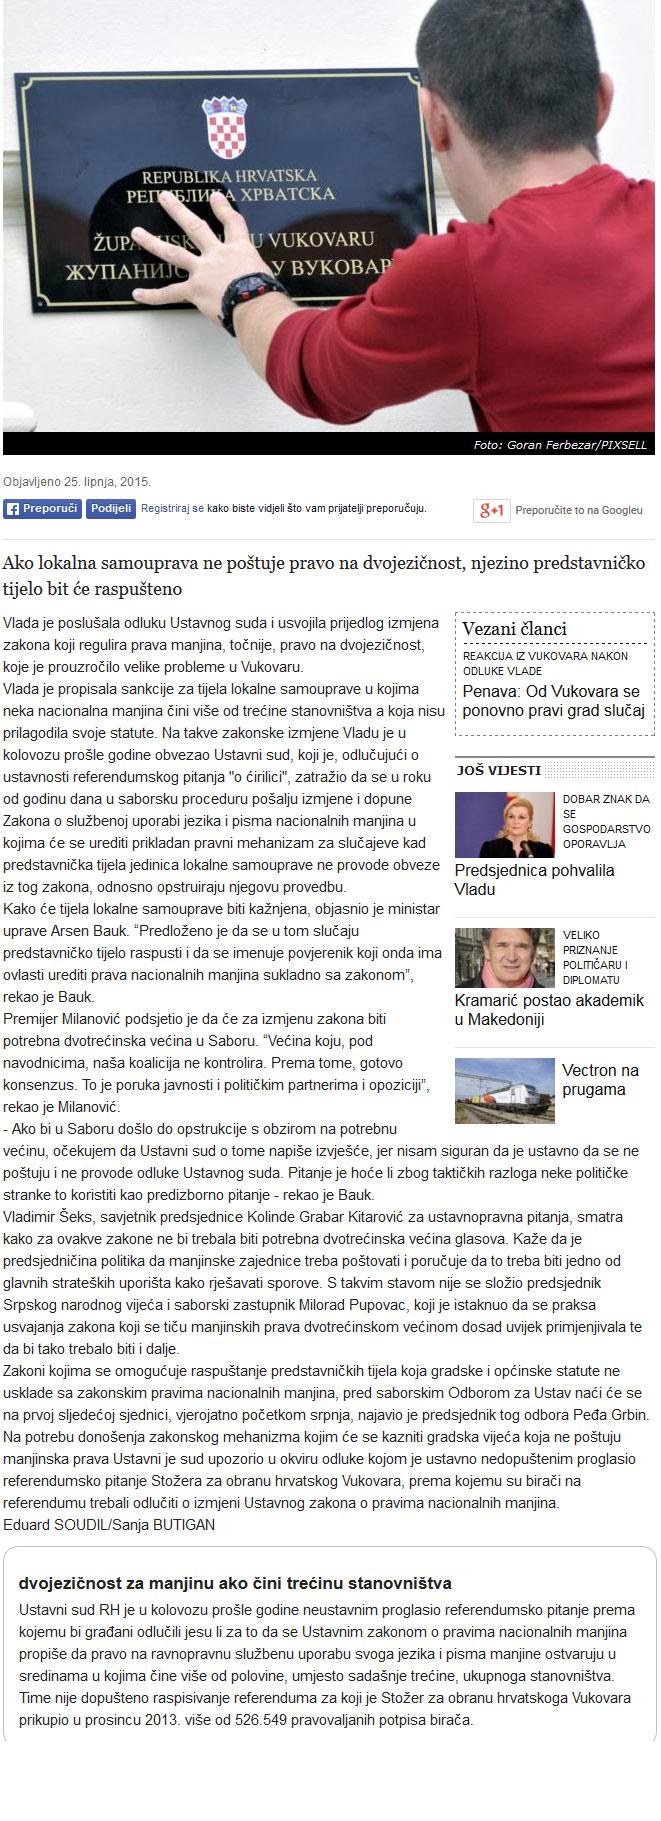 screenshot-www-glas-slavonije-hr-2015-06-26-07-30-53